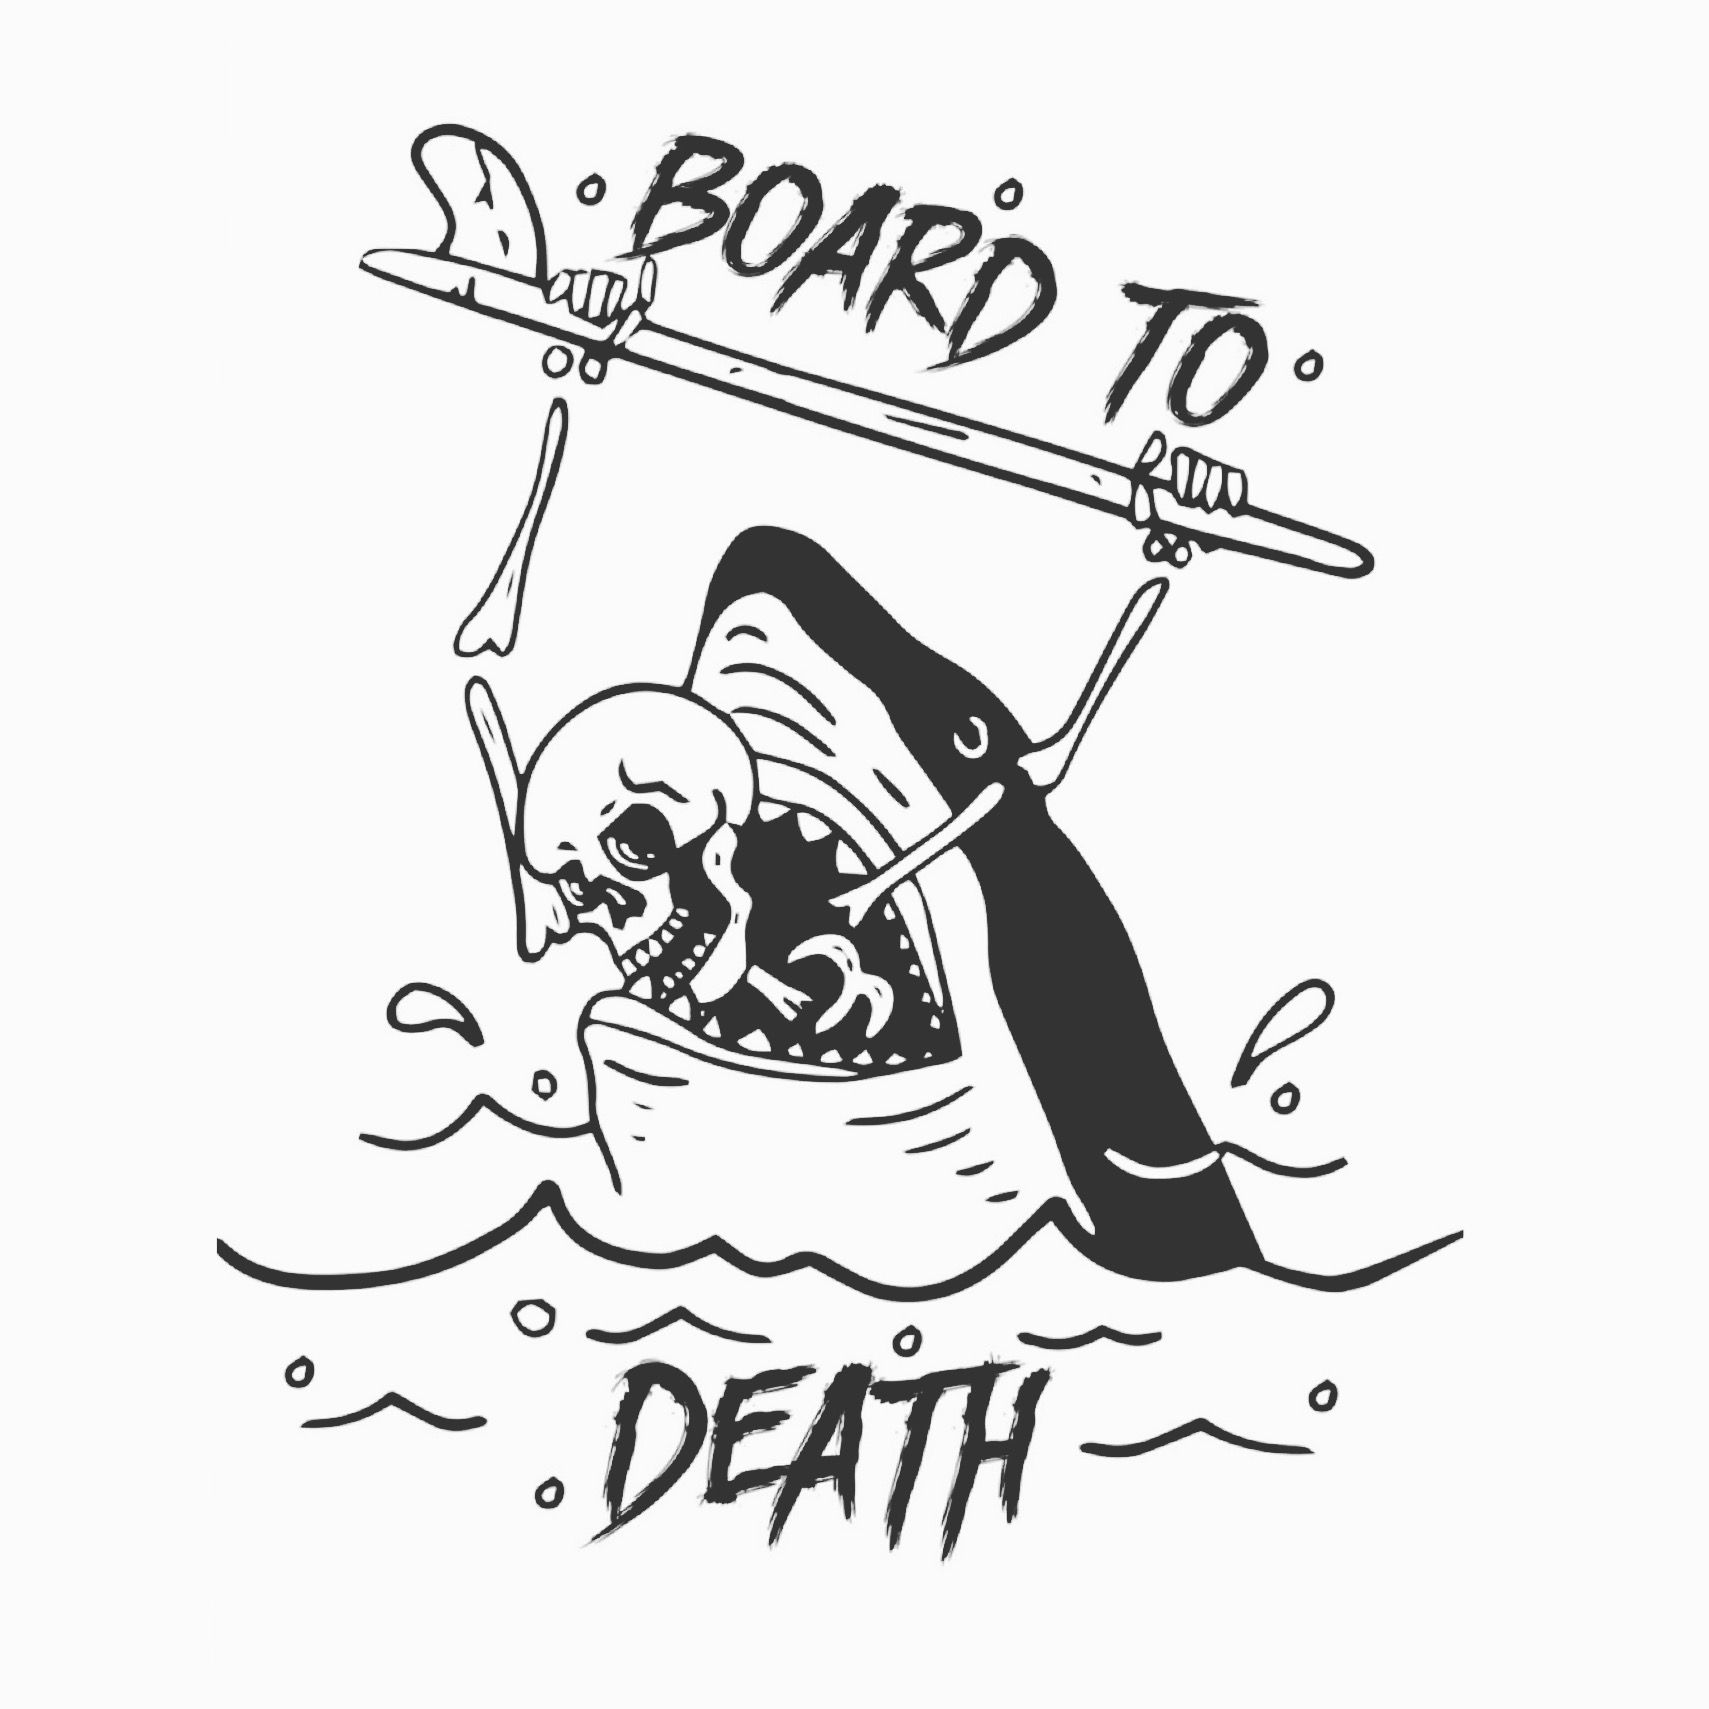 Surf Board Drawing At Getdrawings